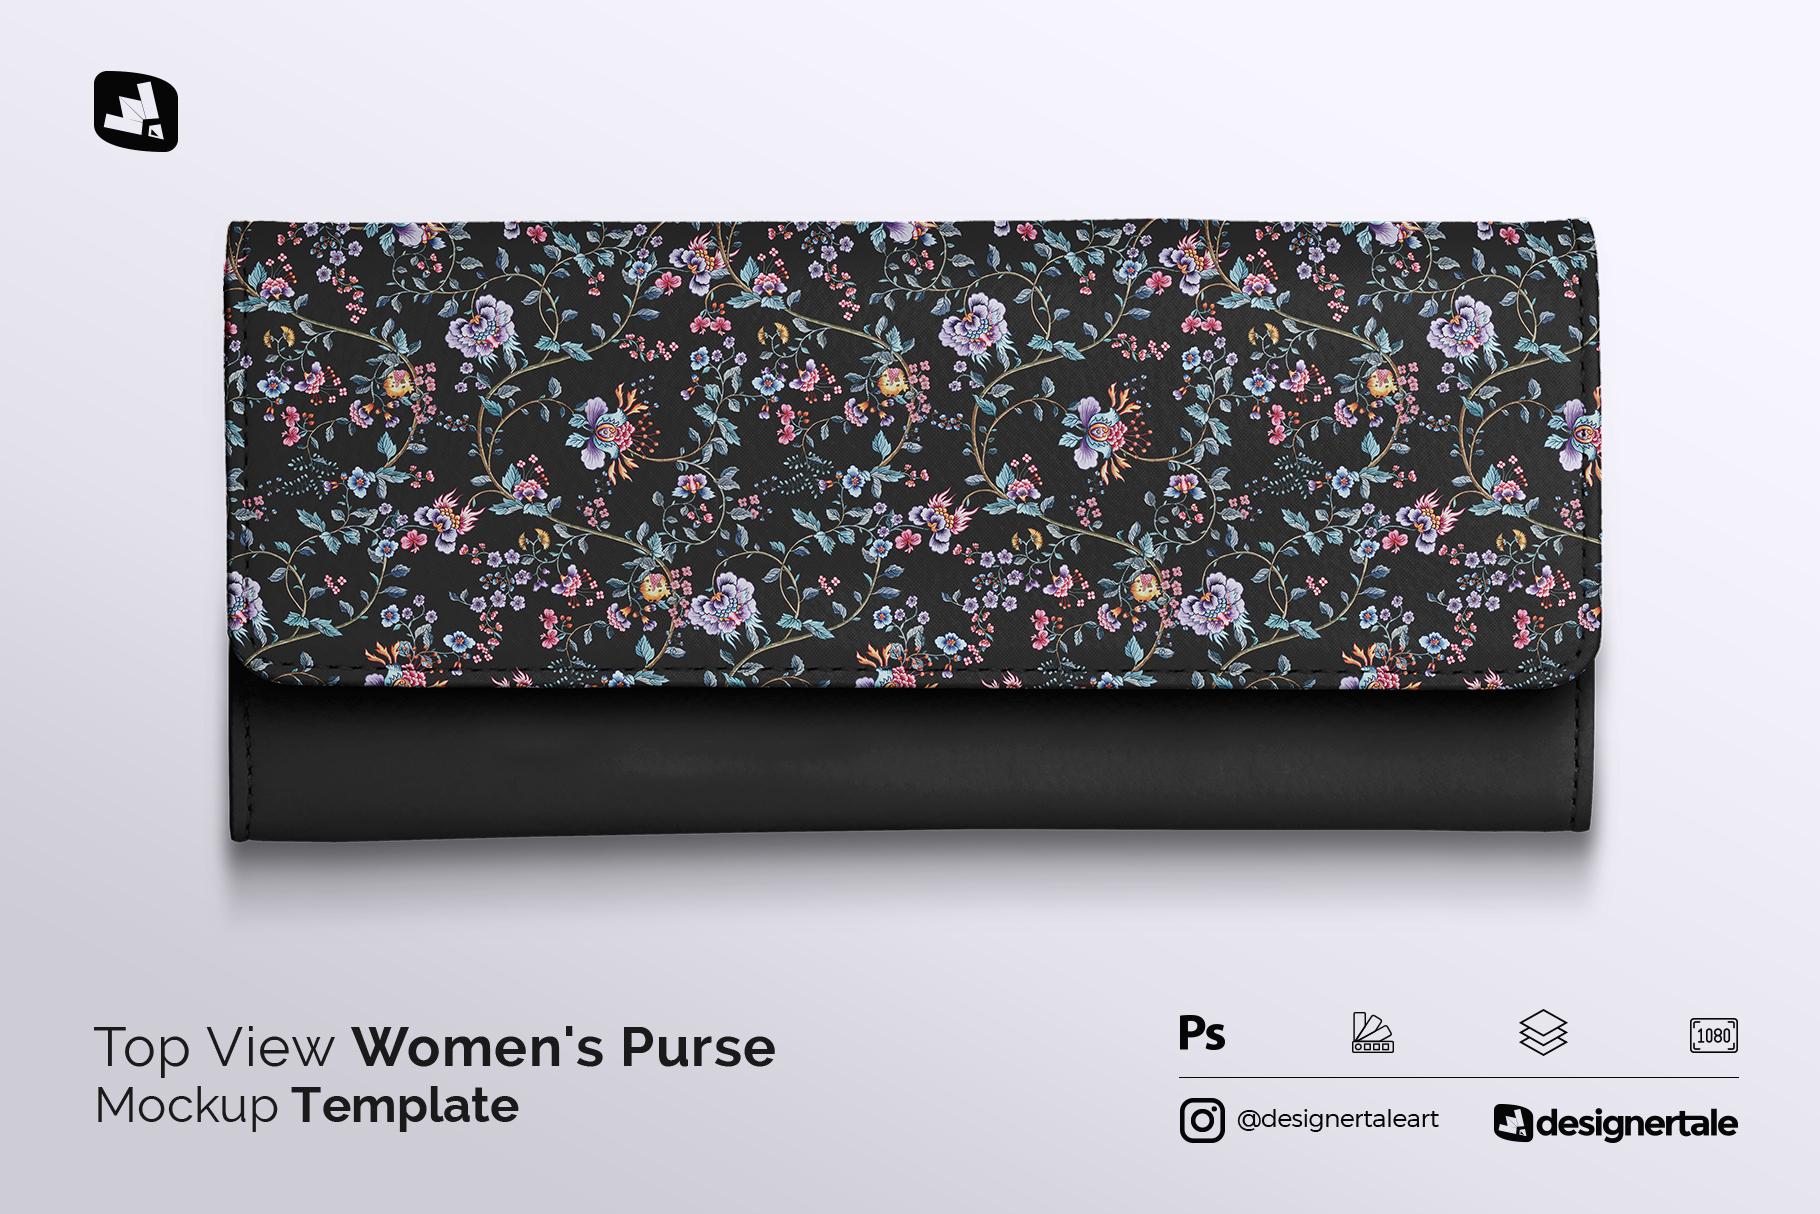 top view women's purse mockup